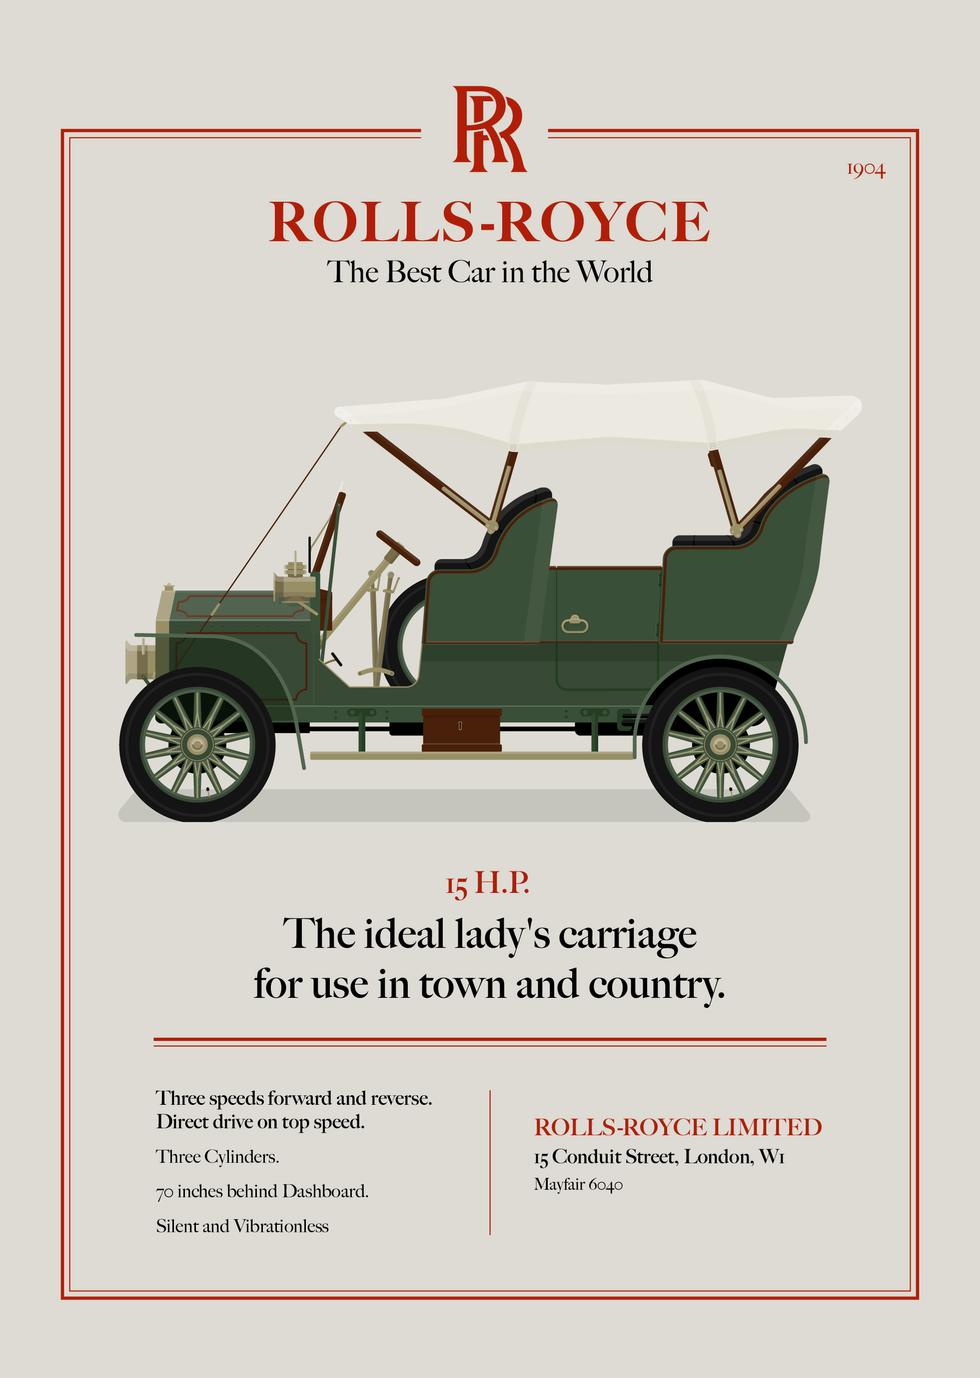 1904 Rolls-Royce 15 H.P.